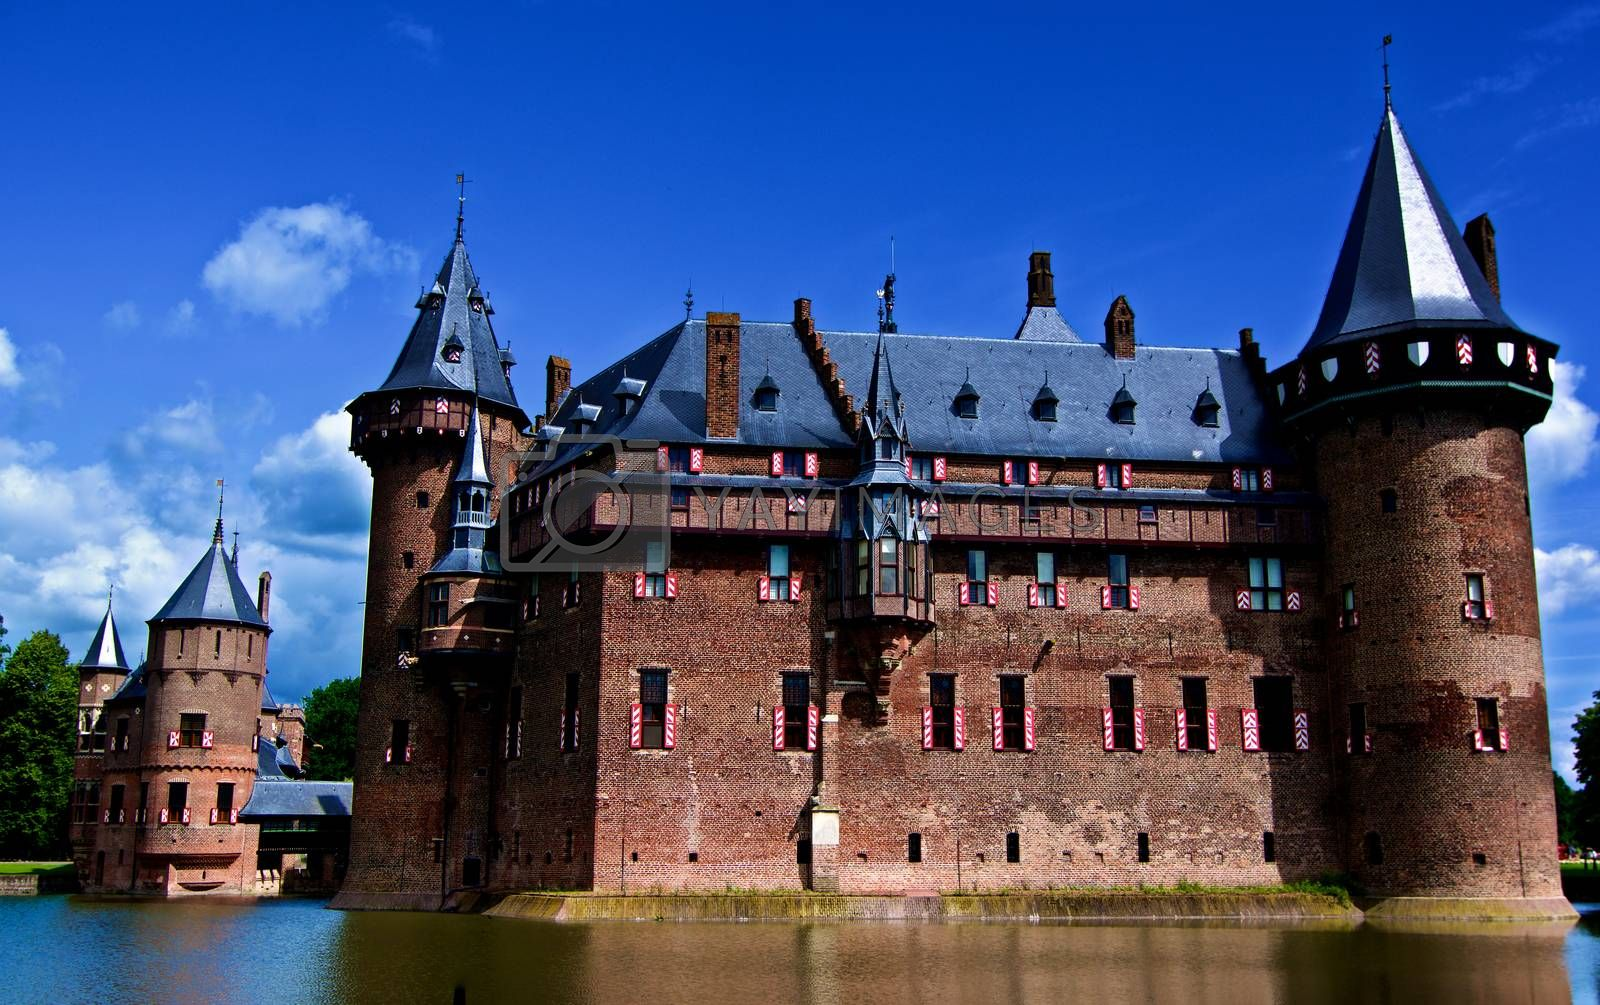 Medieval Castle De Haar from side of Moat against Blue Sky Outdoors. Utrecht, Netherlands